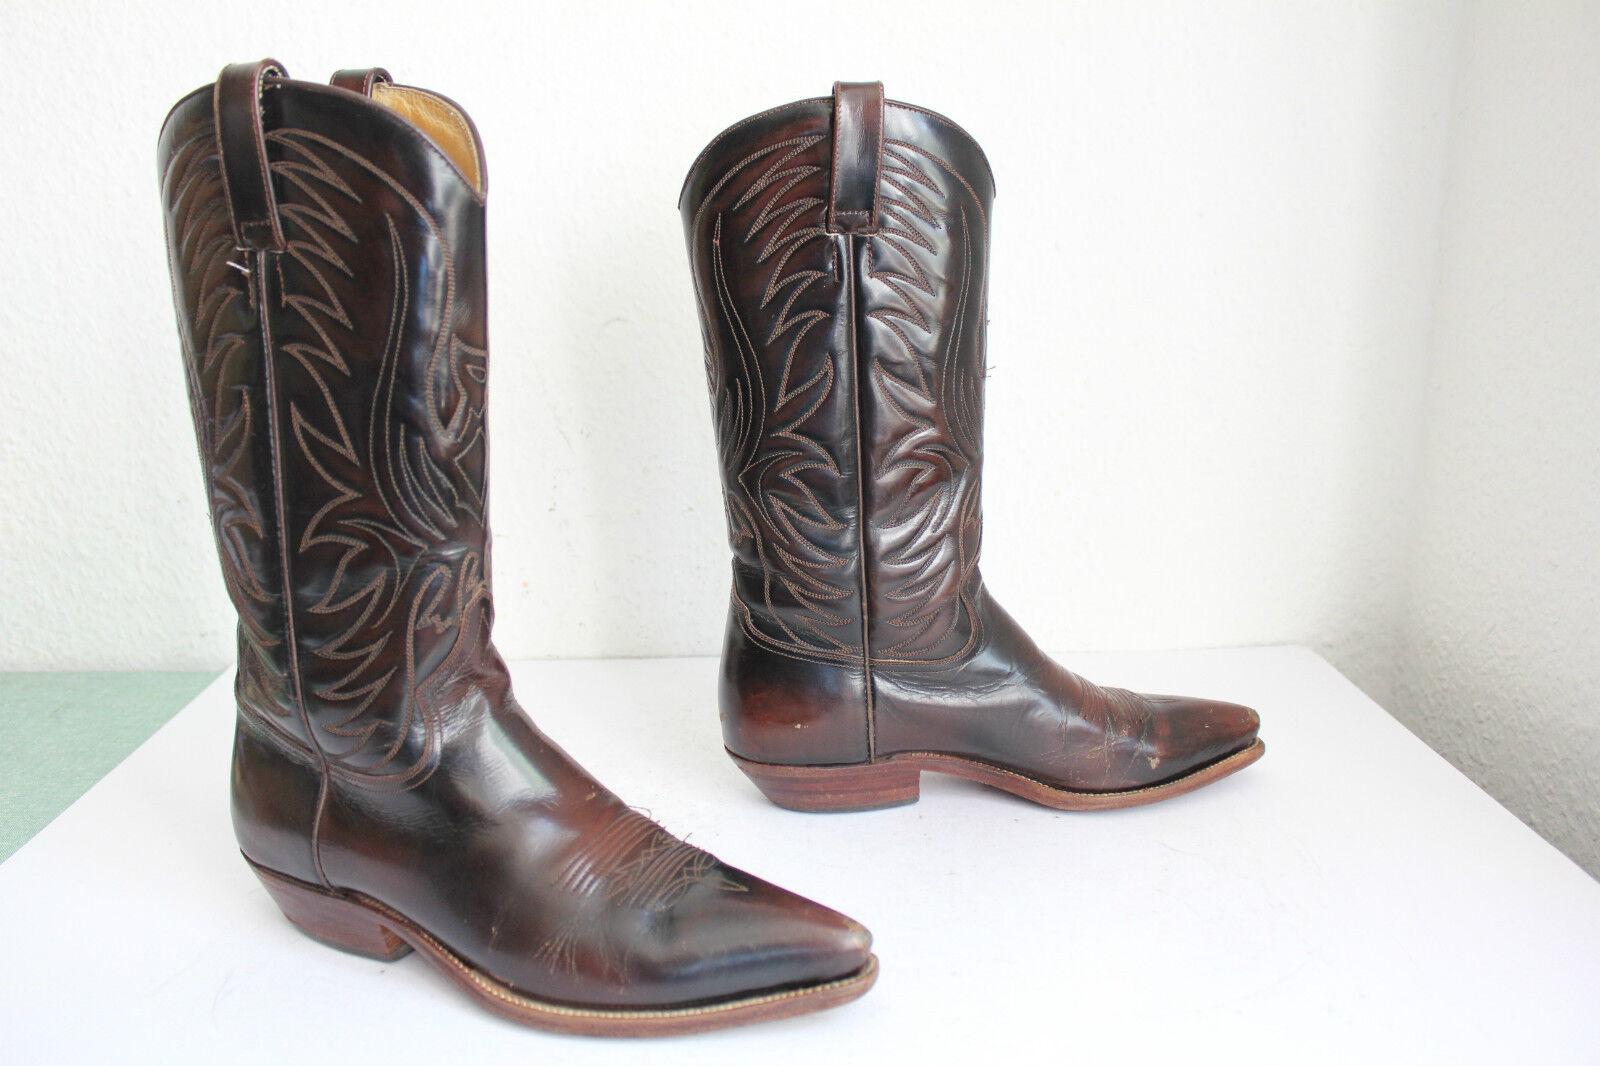 Buffalo western cowboy bottes bottes pleinehommest véritable cuir marron eu 36, 5 made in Mexico